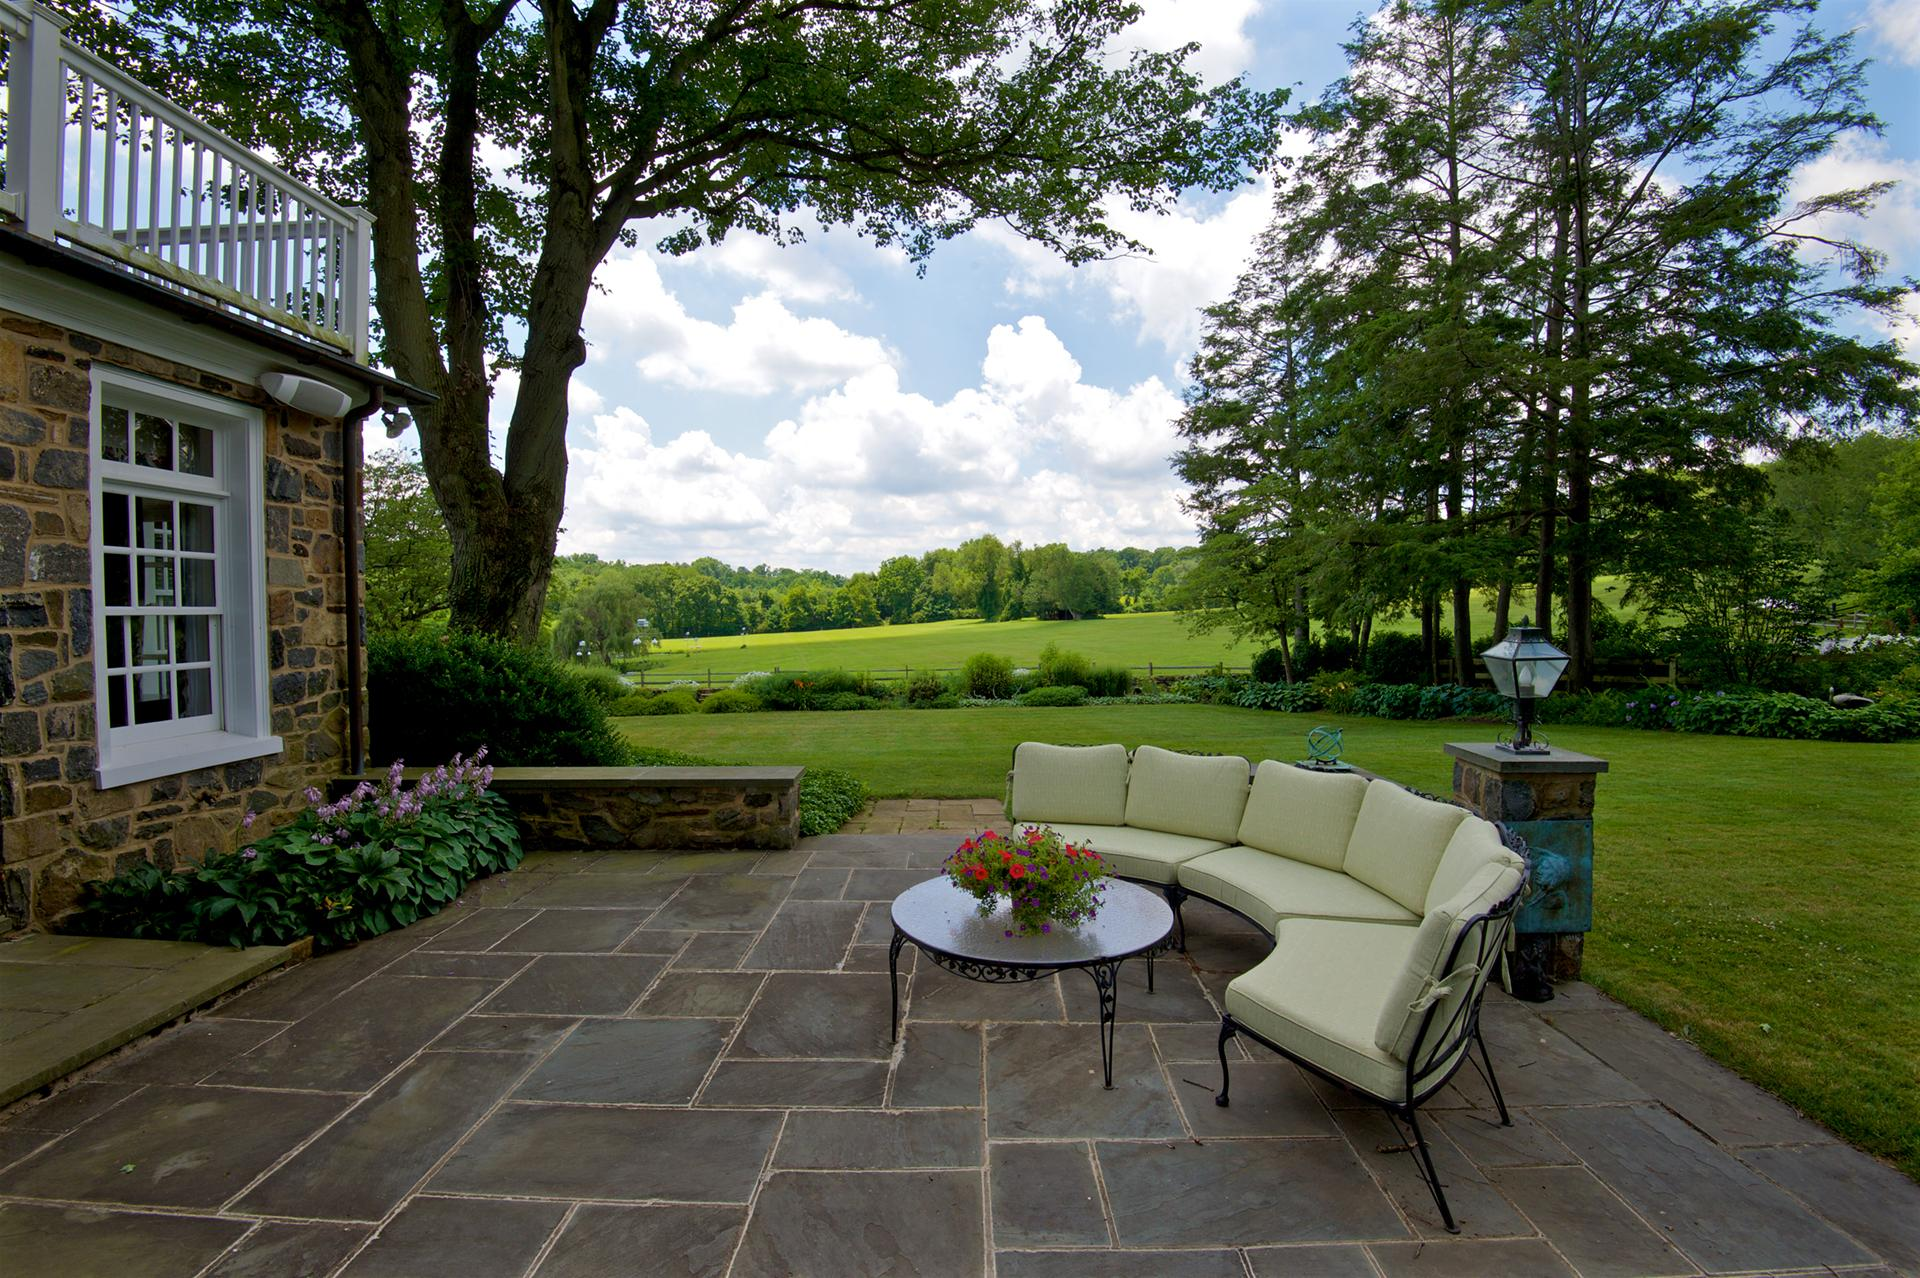 bluestone-patio-stone-paving-path-elegant-garden-design-greenville-de